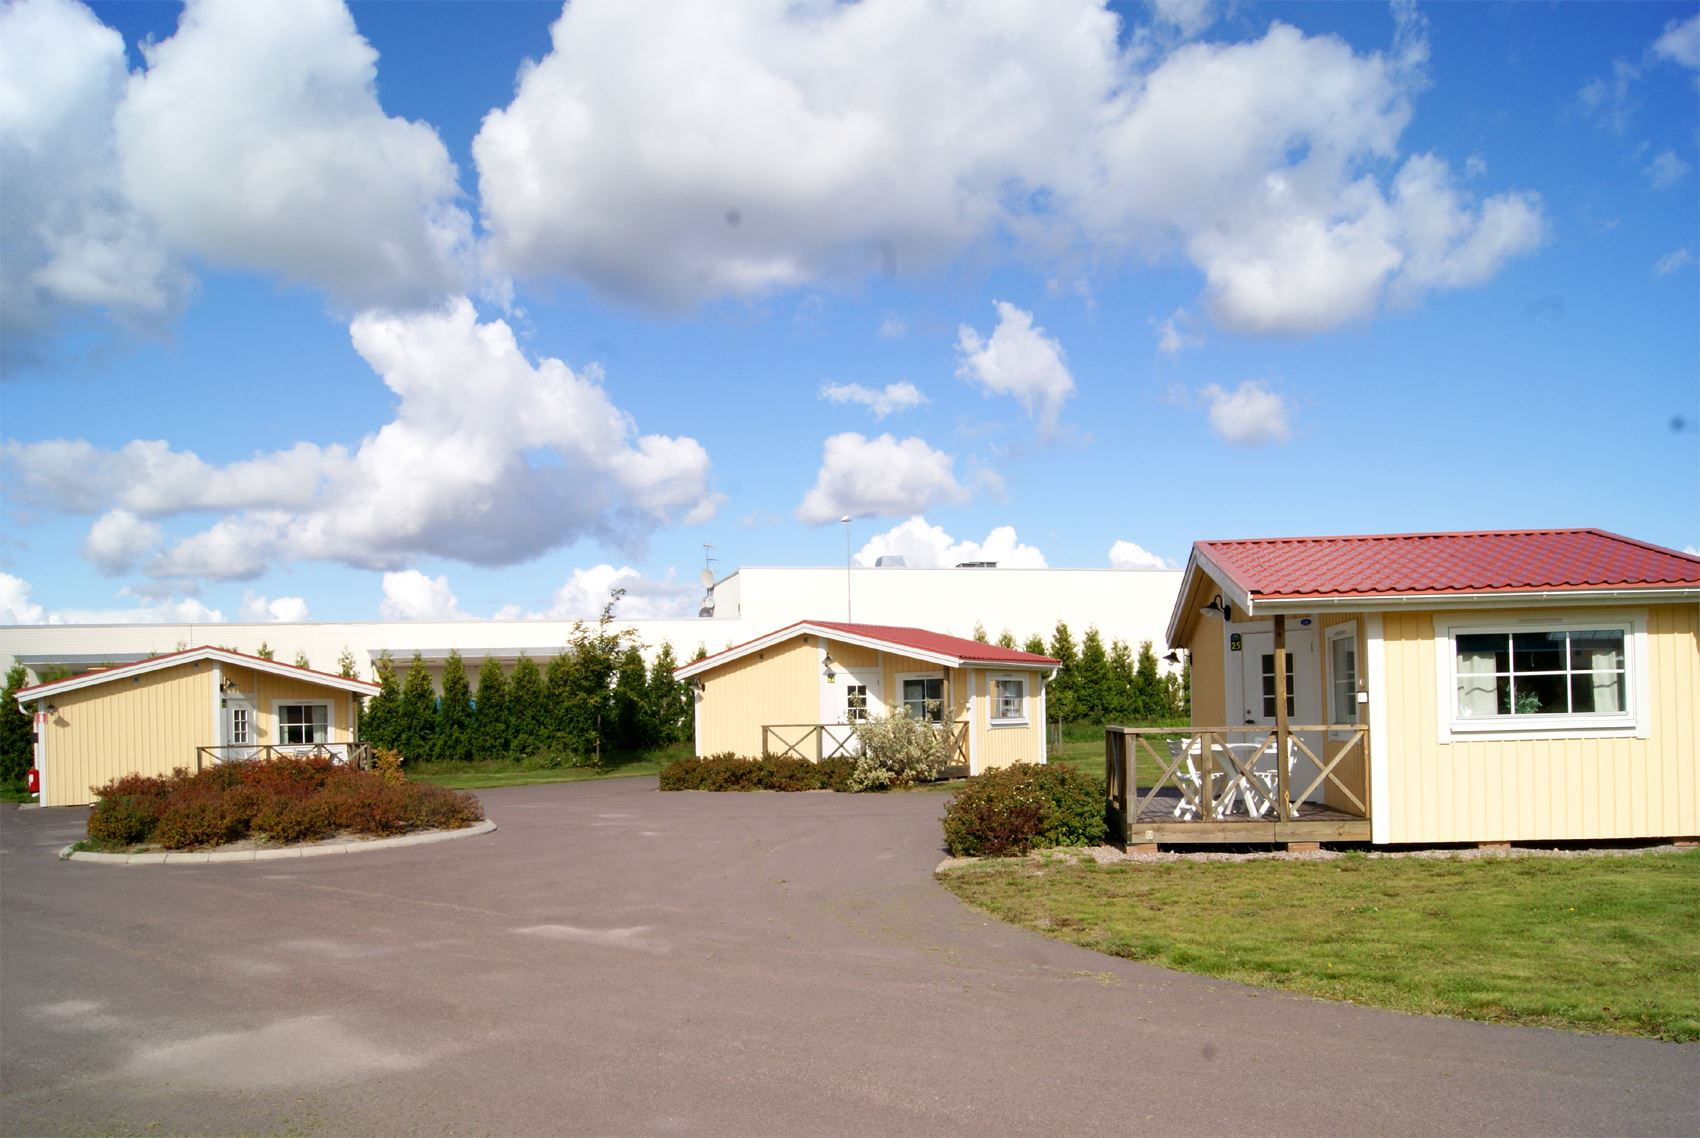 Parken Zoo Camping & Stugby/Ferienhäuser